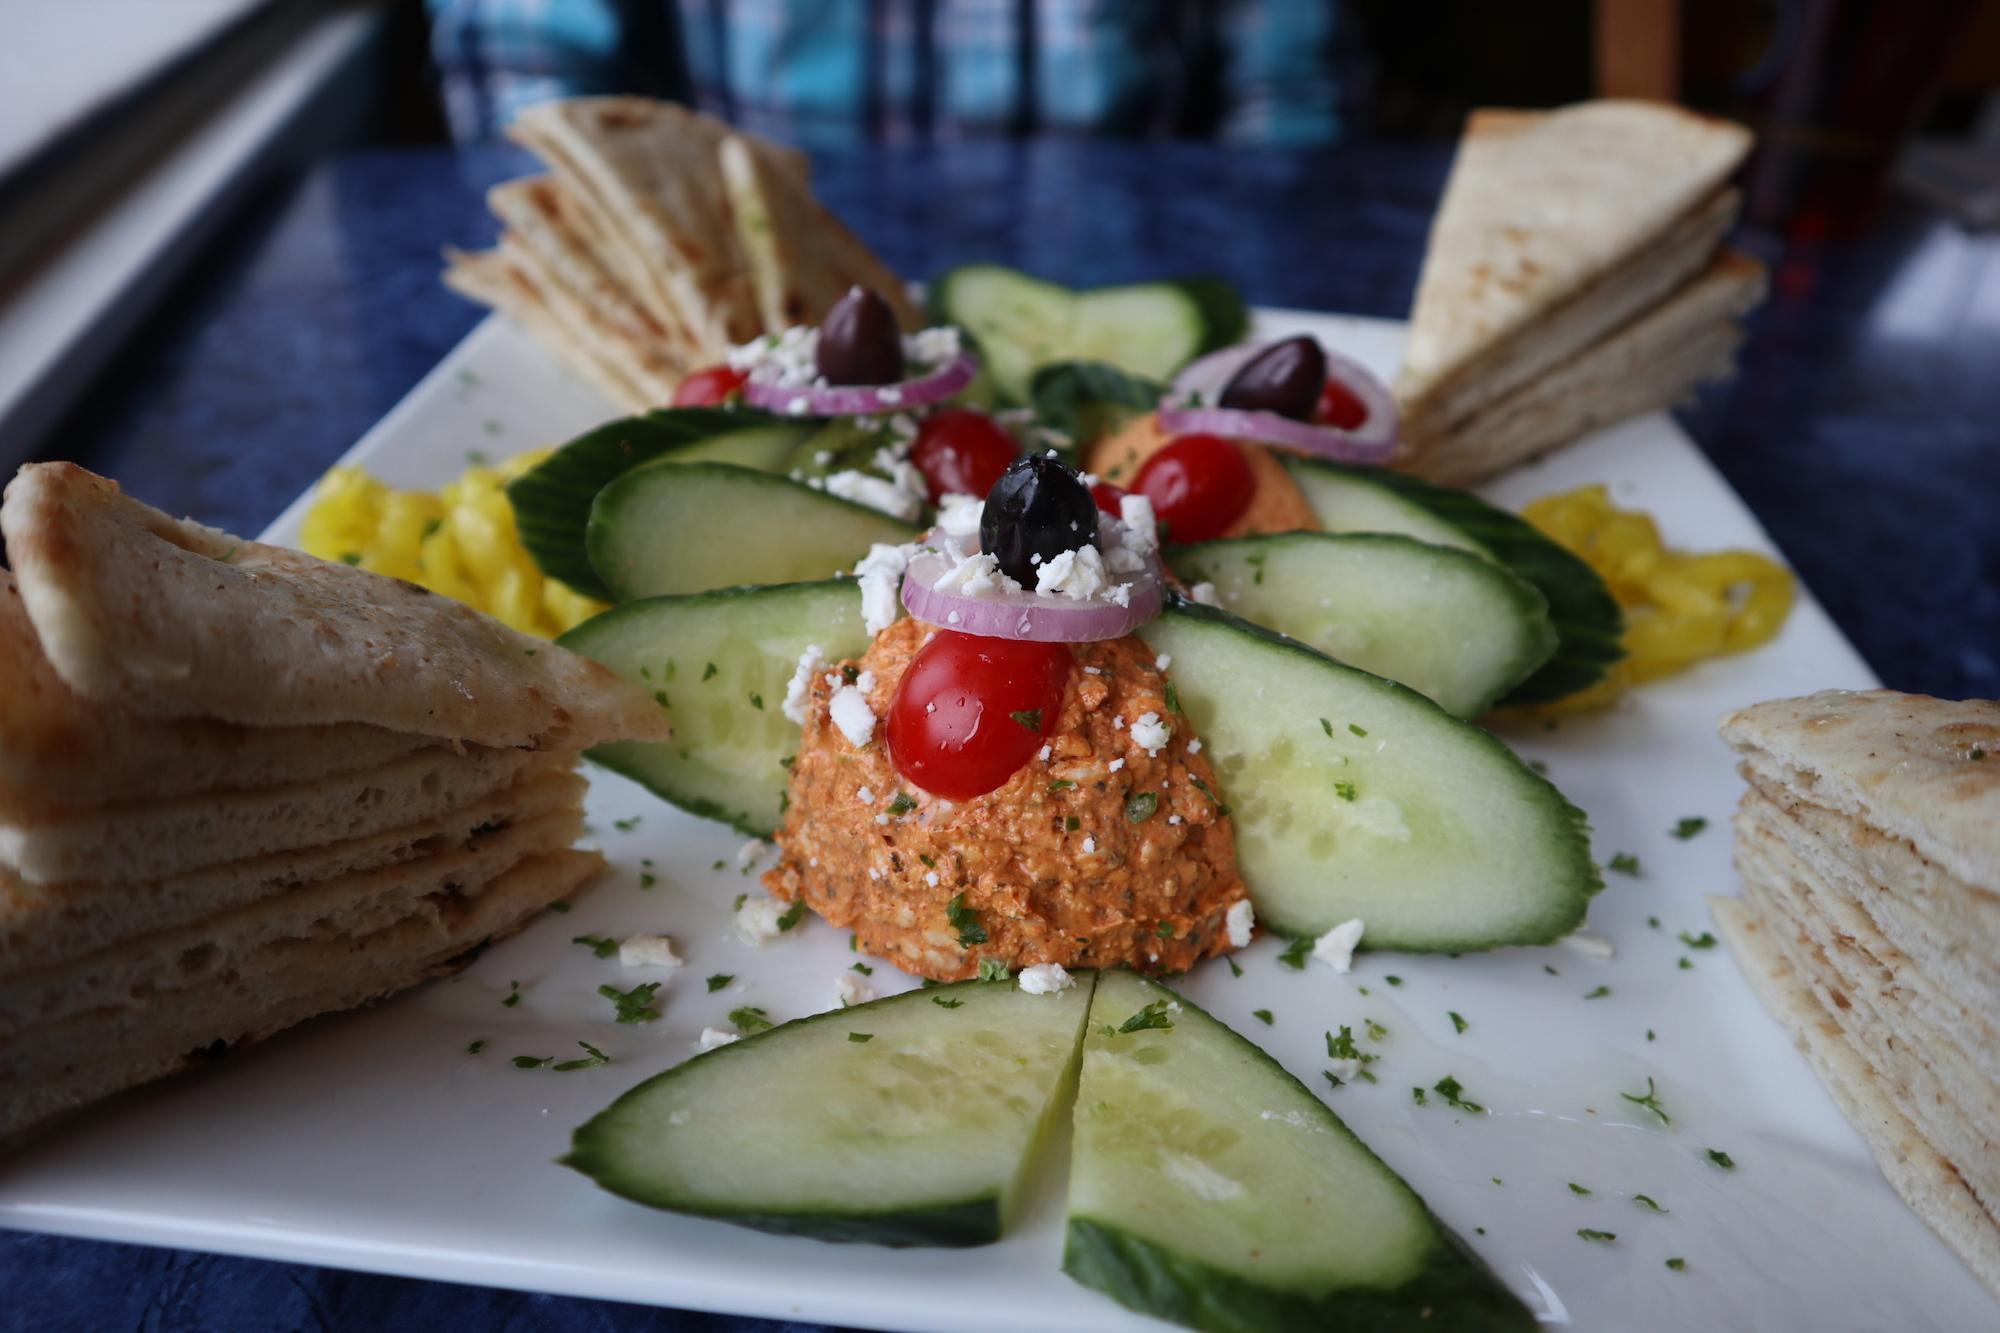 3 Greek dips: Hummus (chickpeas, garlic, tahini, & spices), Fire Feta dip (feta & spices), Mt. Olympus Dip (cilantro, parsley, chickpeas, tahini, & spices)